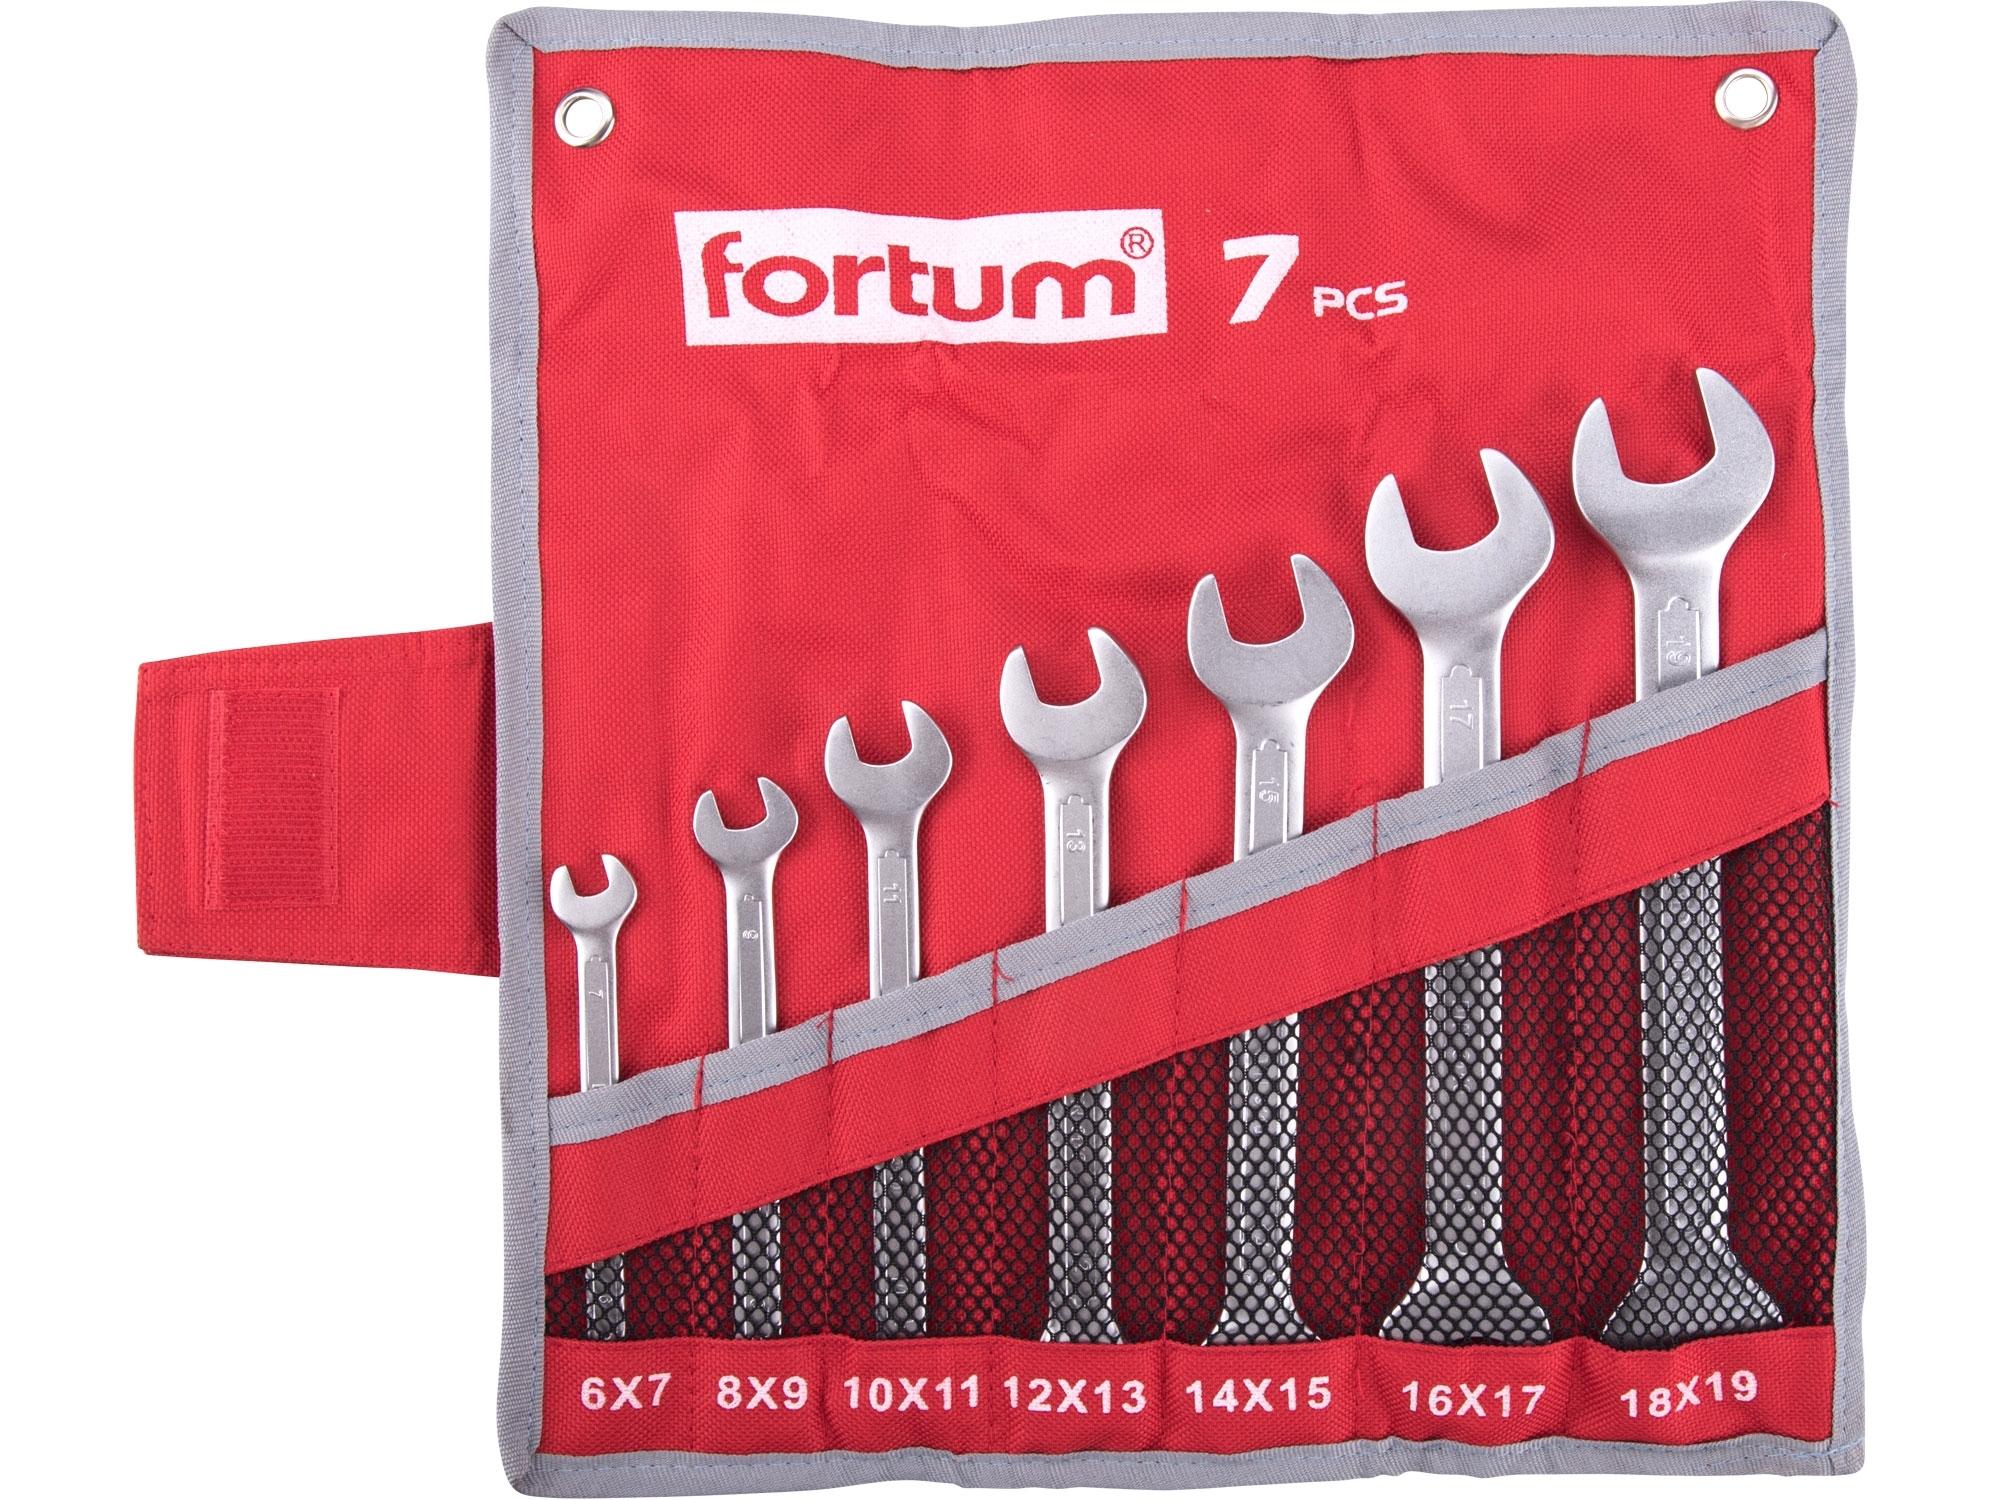 klíče ploché, sada 7ks, 6-19mm, FORTUM 4730103